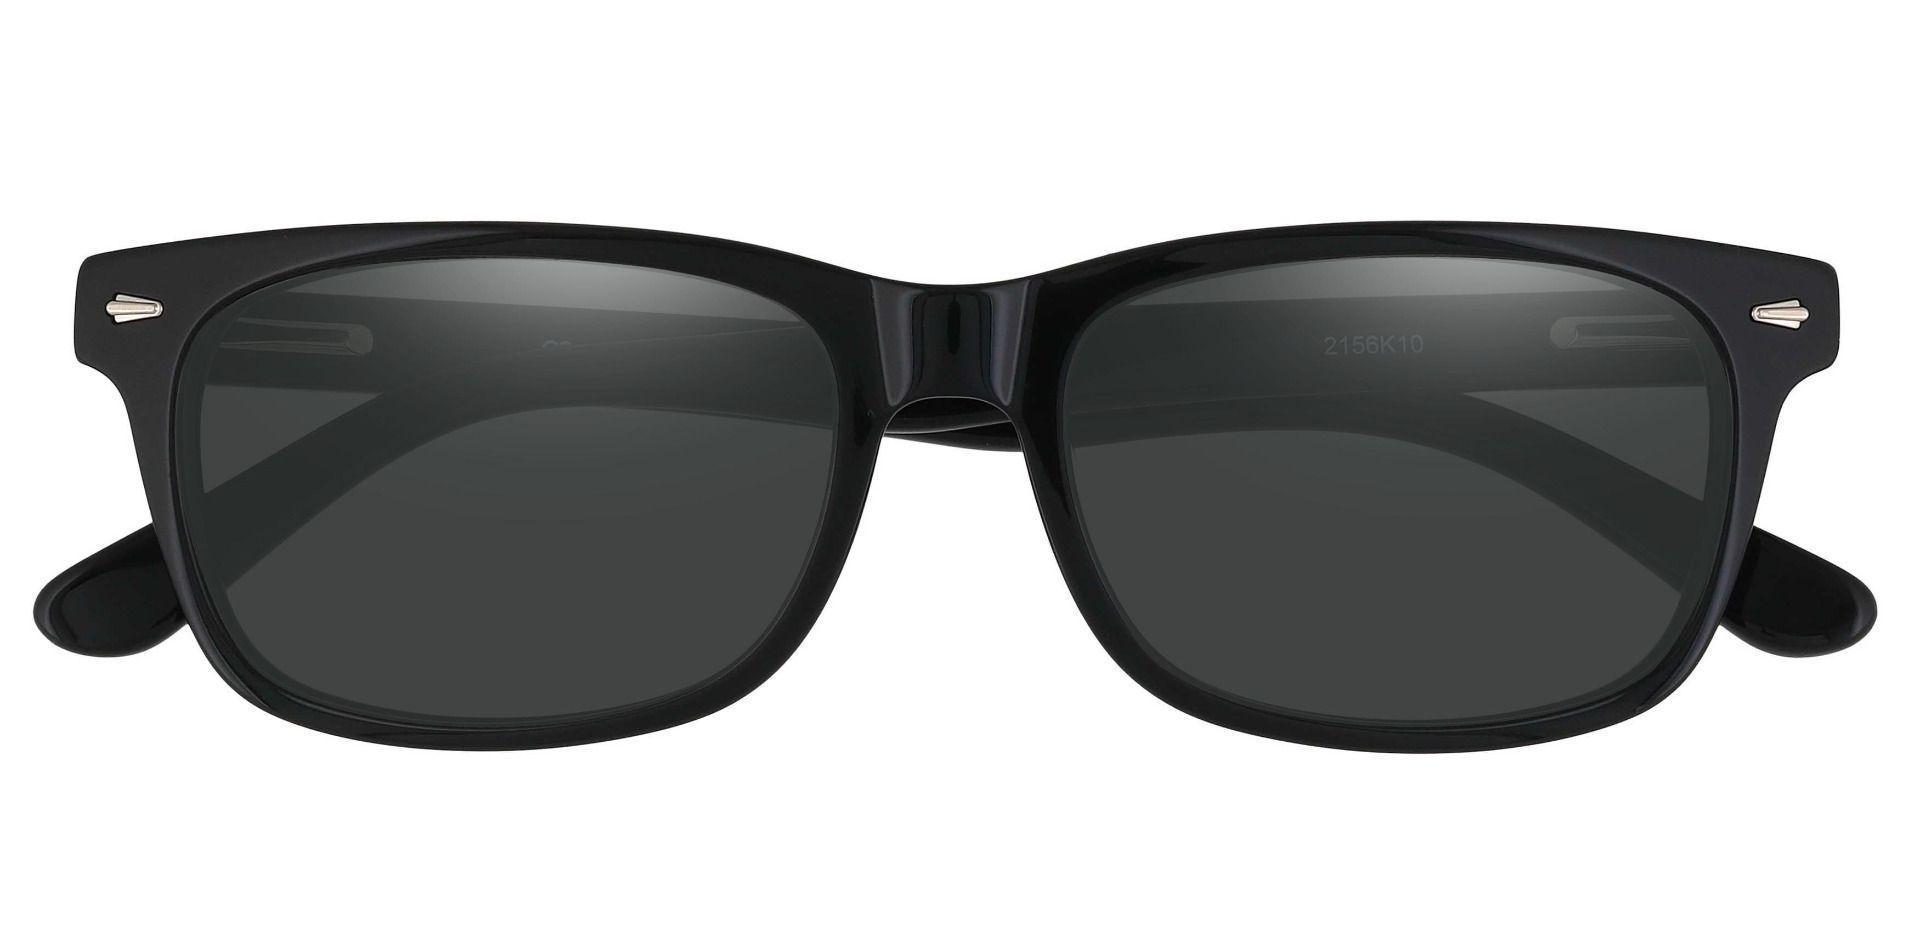 Hendrix Rectangle Prescription Sunglasses - Black Frame With Gray Lenses